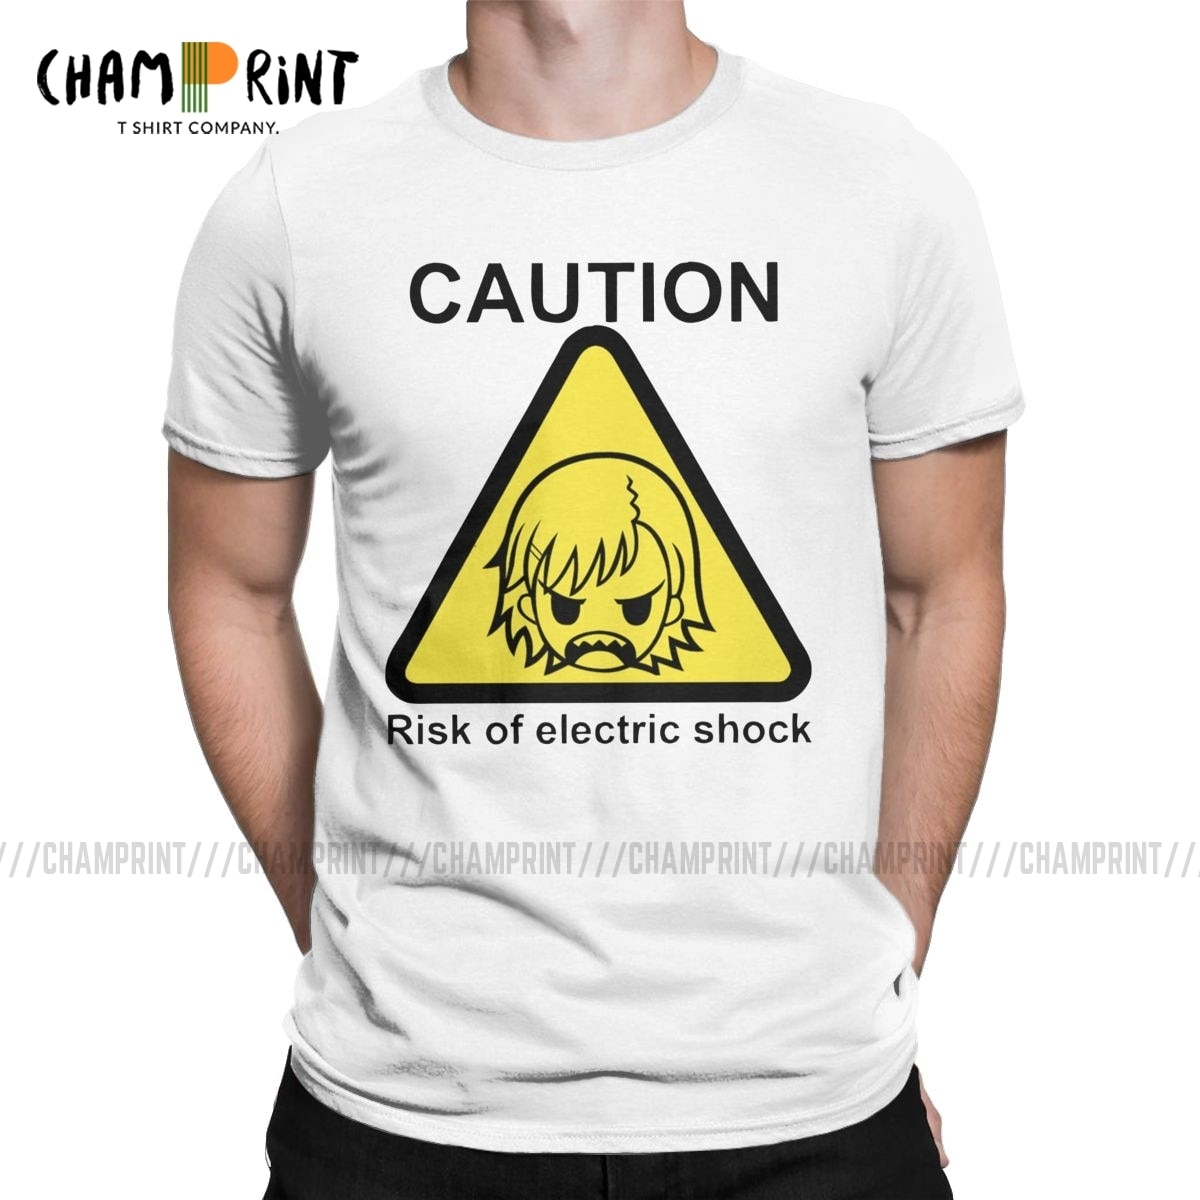 Um certo choque elétrico científico t camisas homem lazer camiseta um certo científico railgun misaka anime camiseta